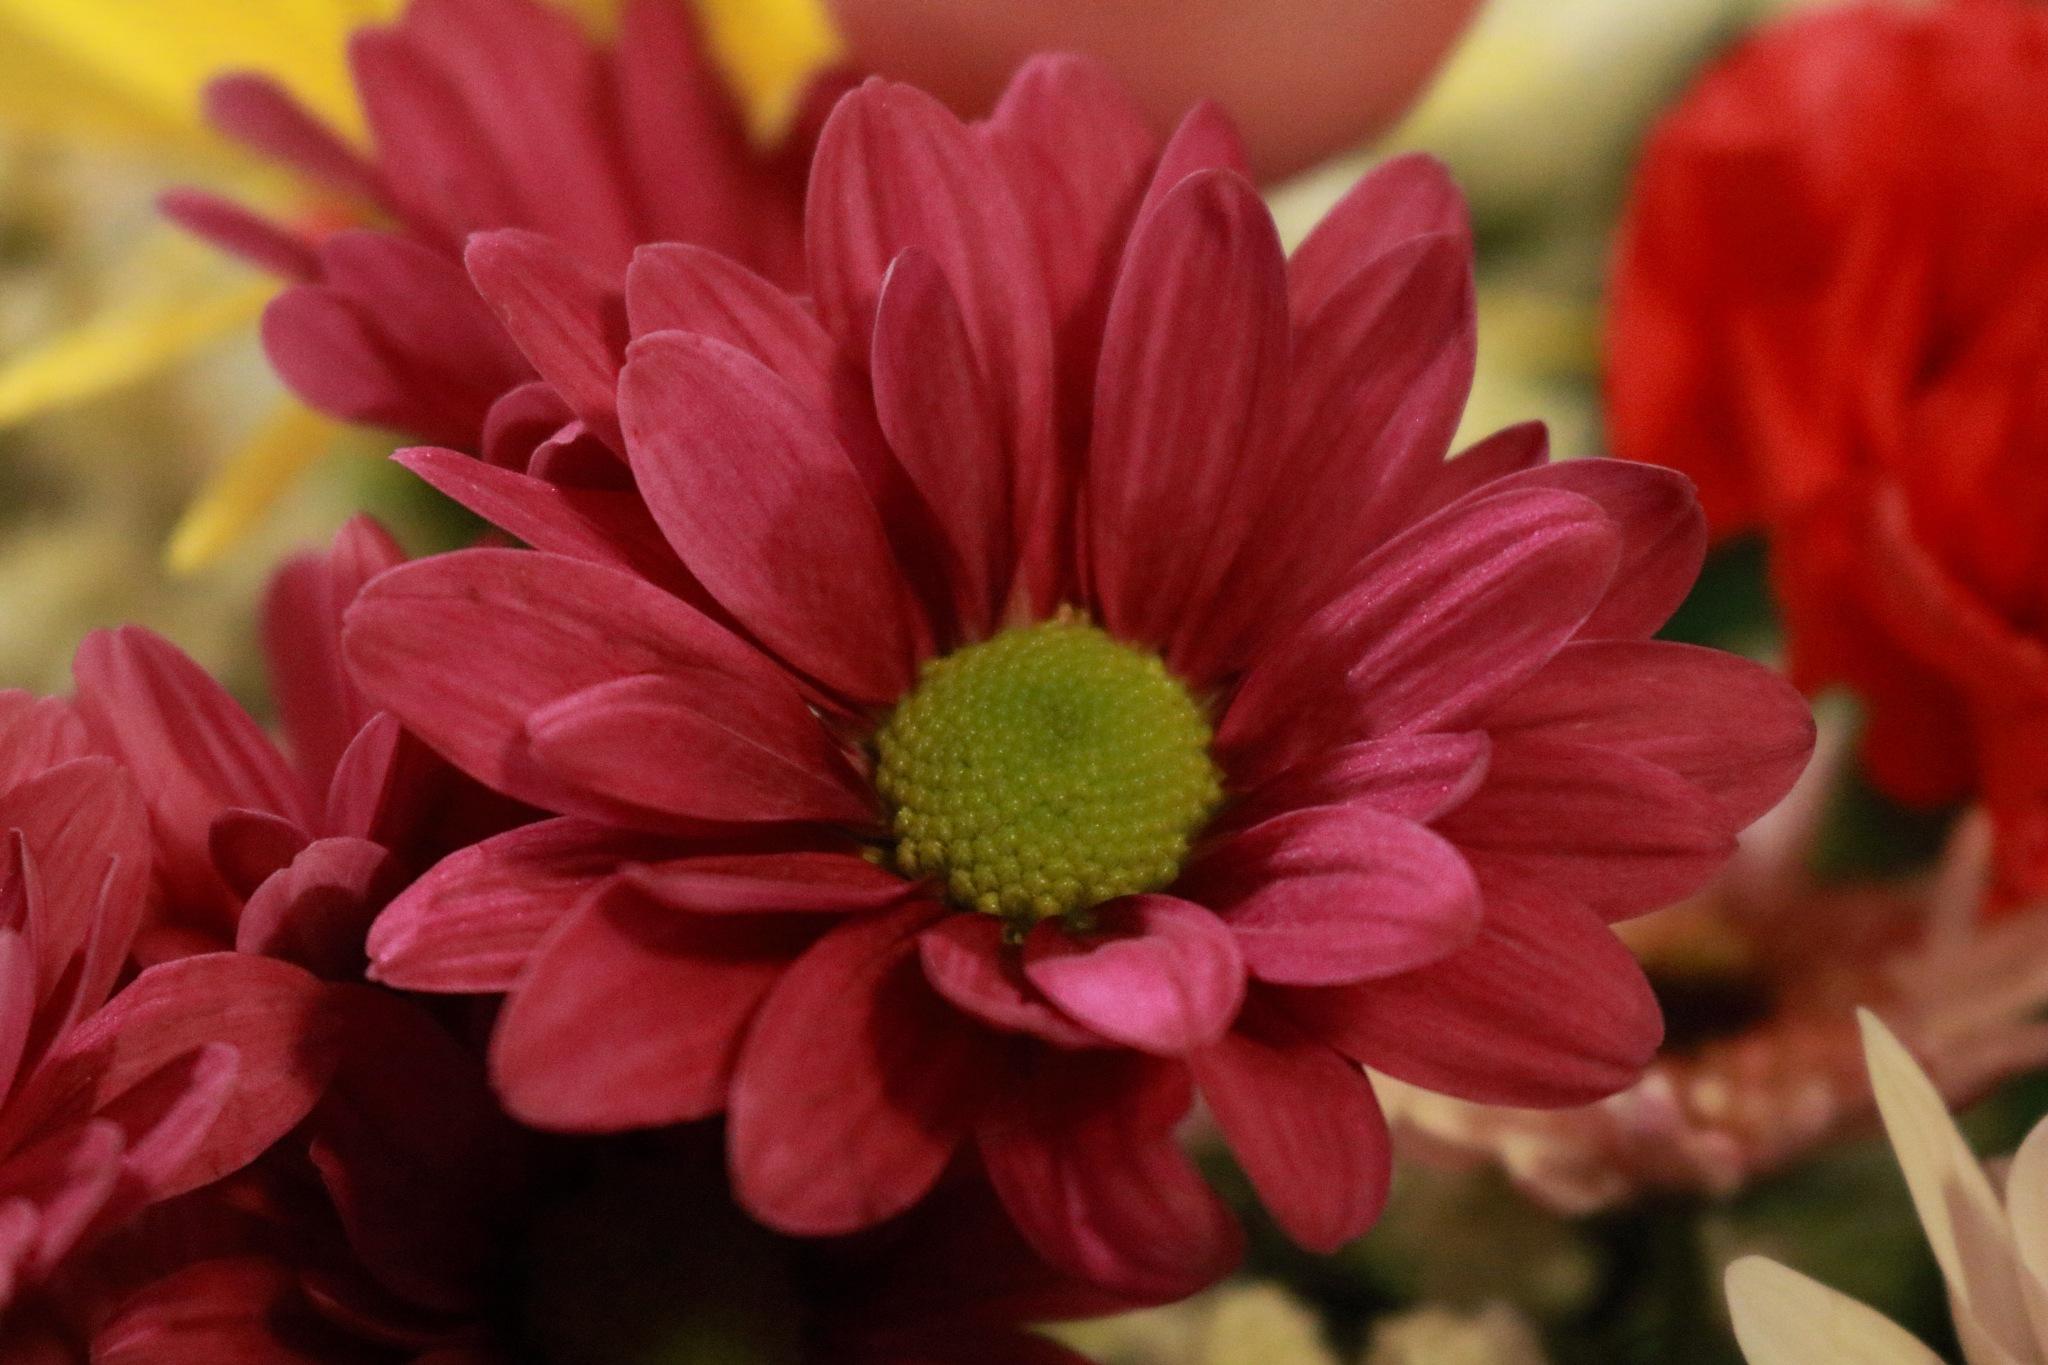 fusia daisy by Peter O Merz